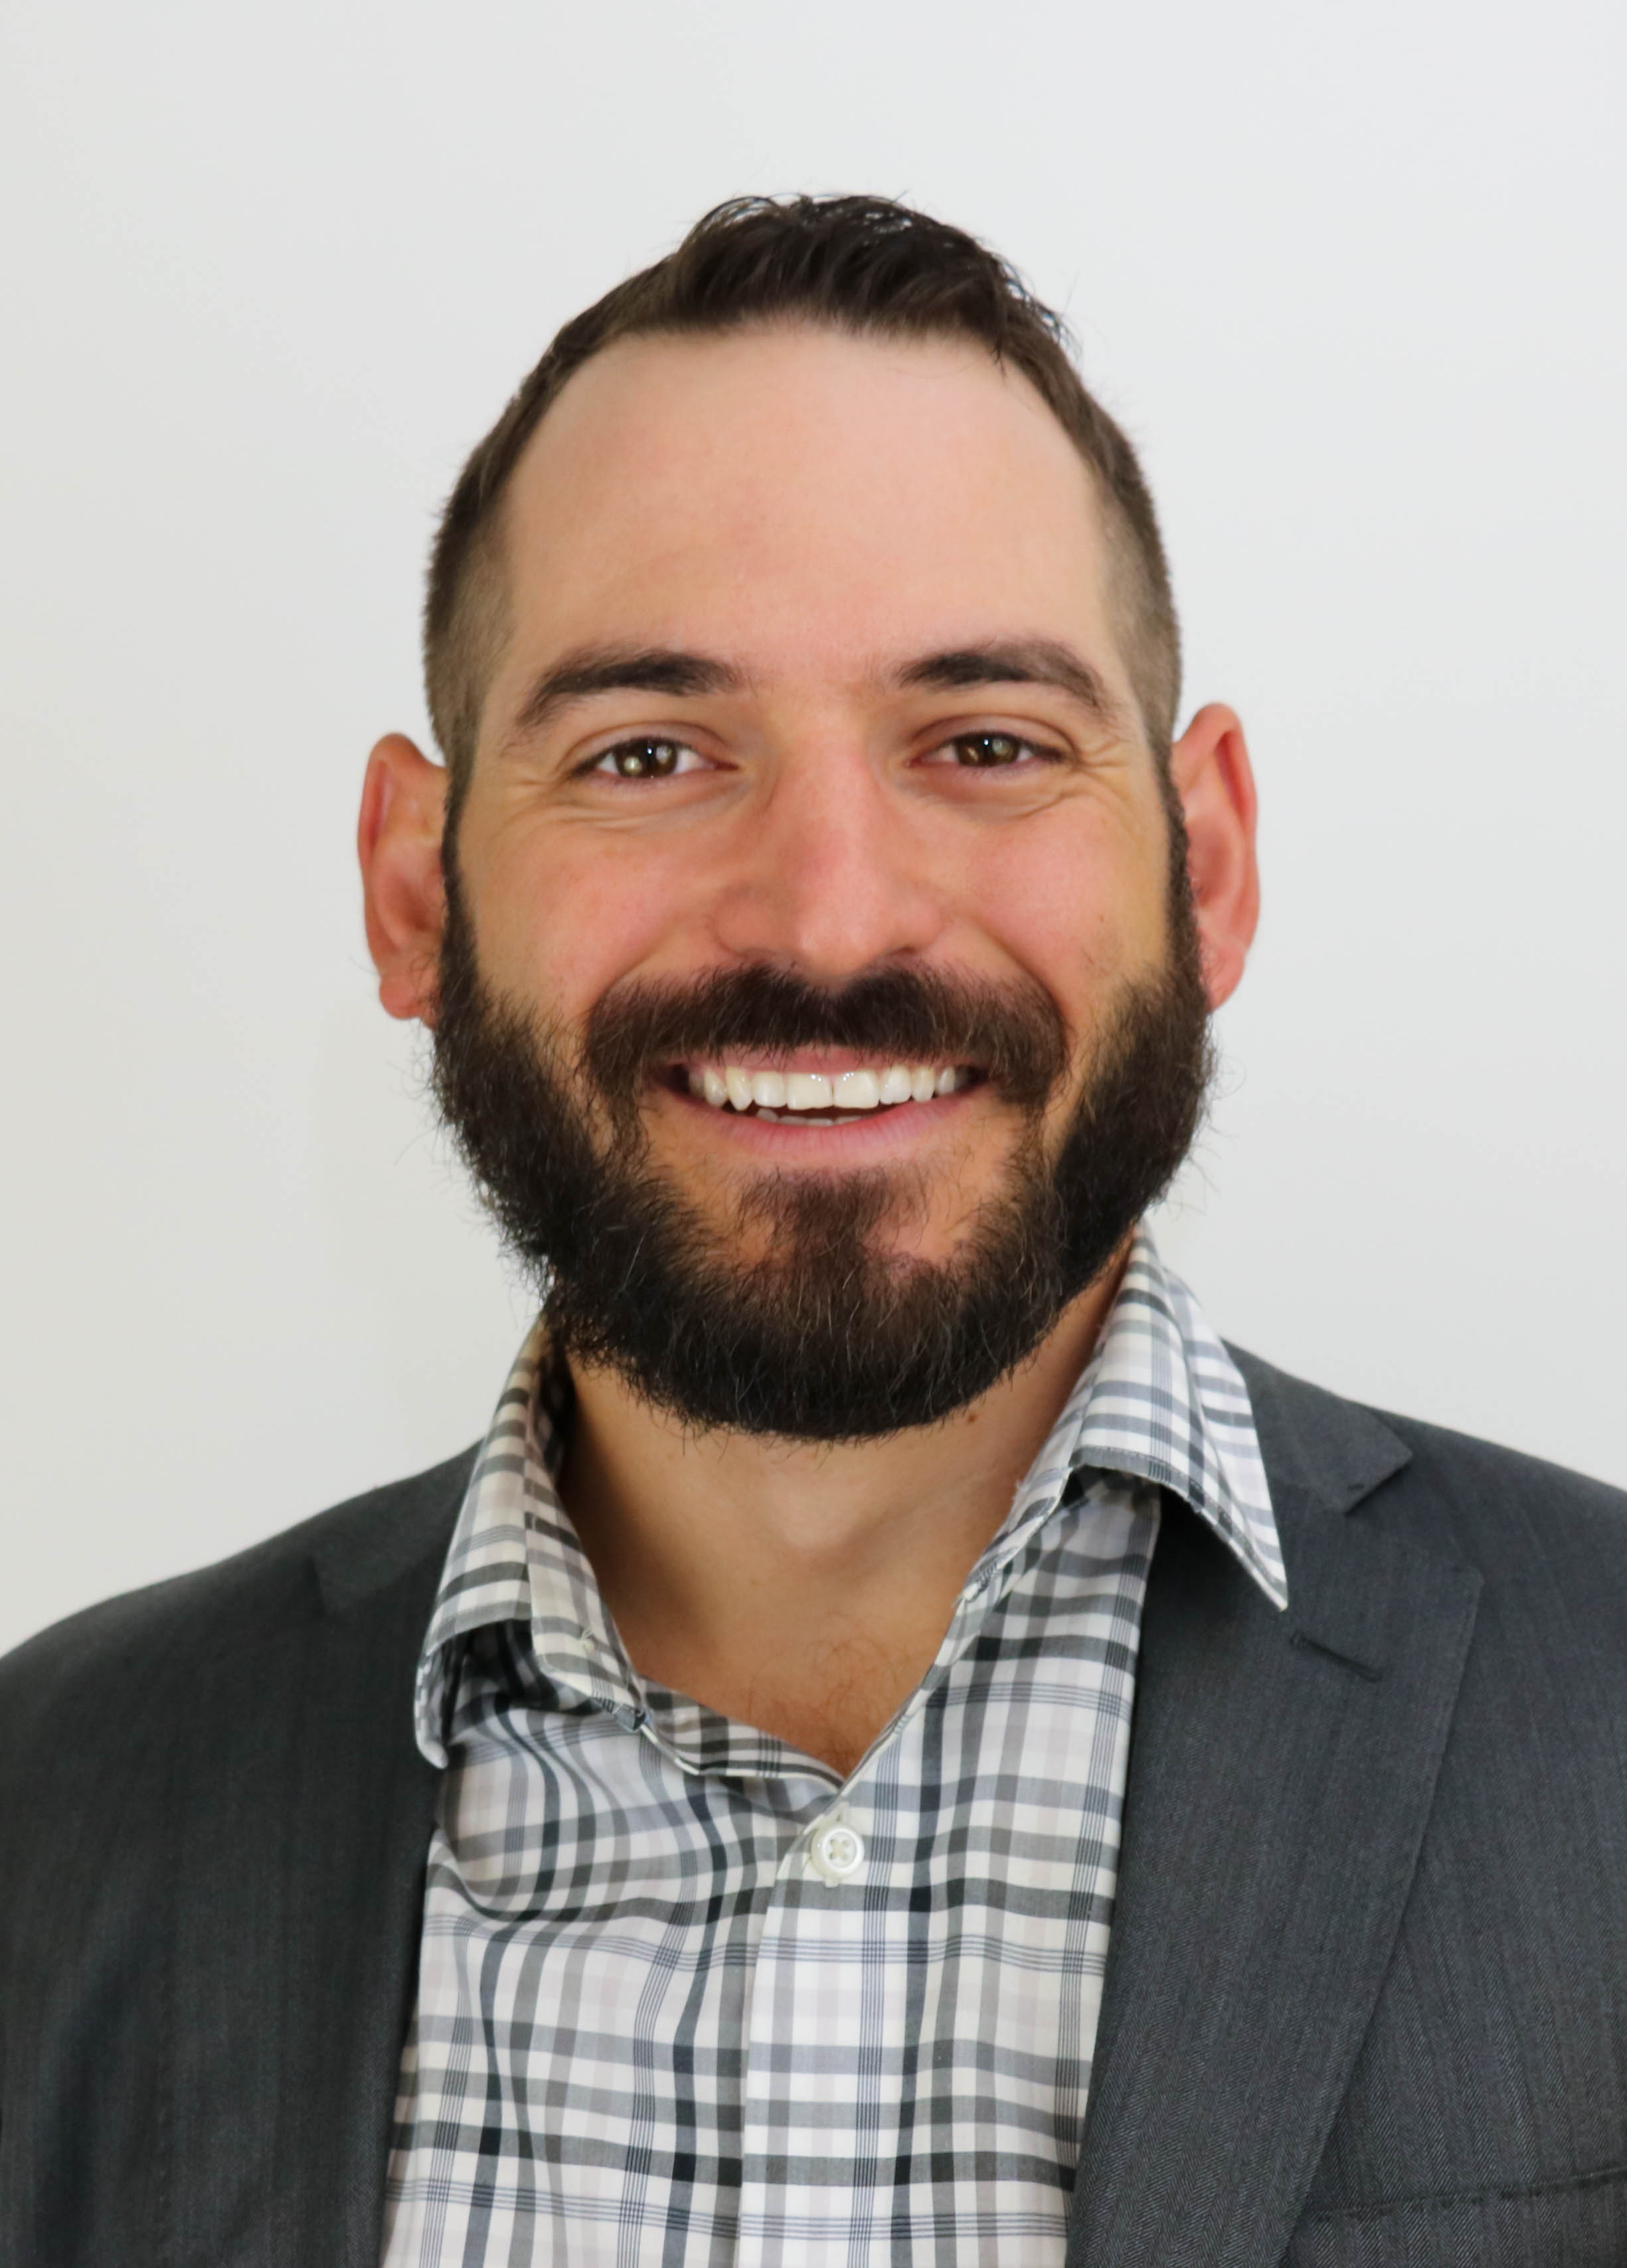 Joe Loverde, Digital Director